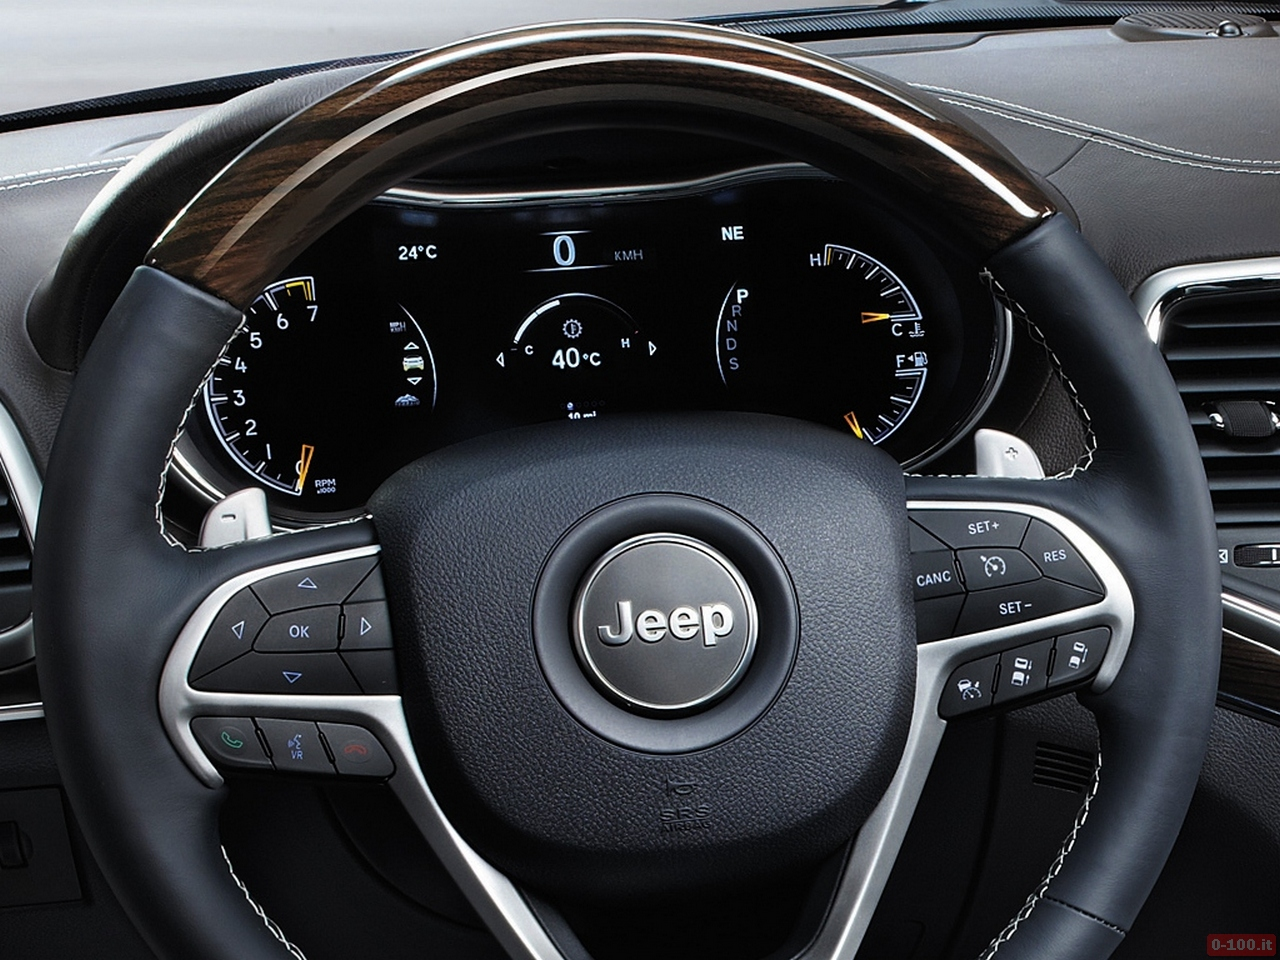 0-100.it | Jeep Grand Cherokee MY 2014